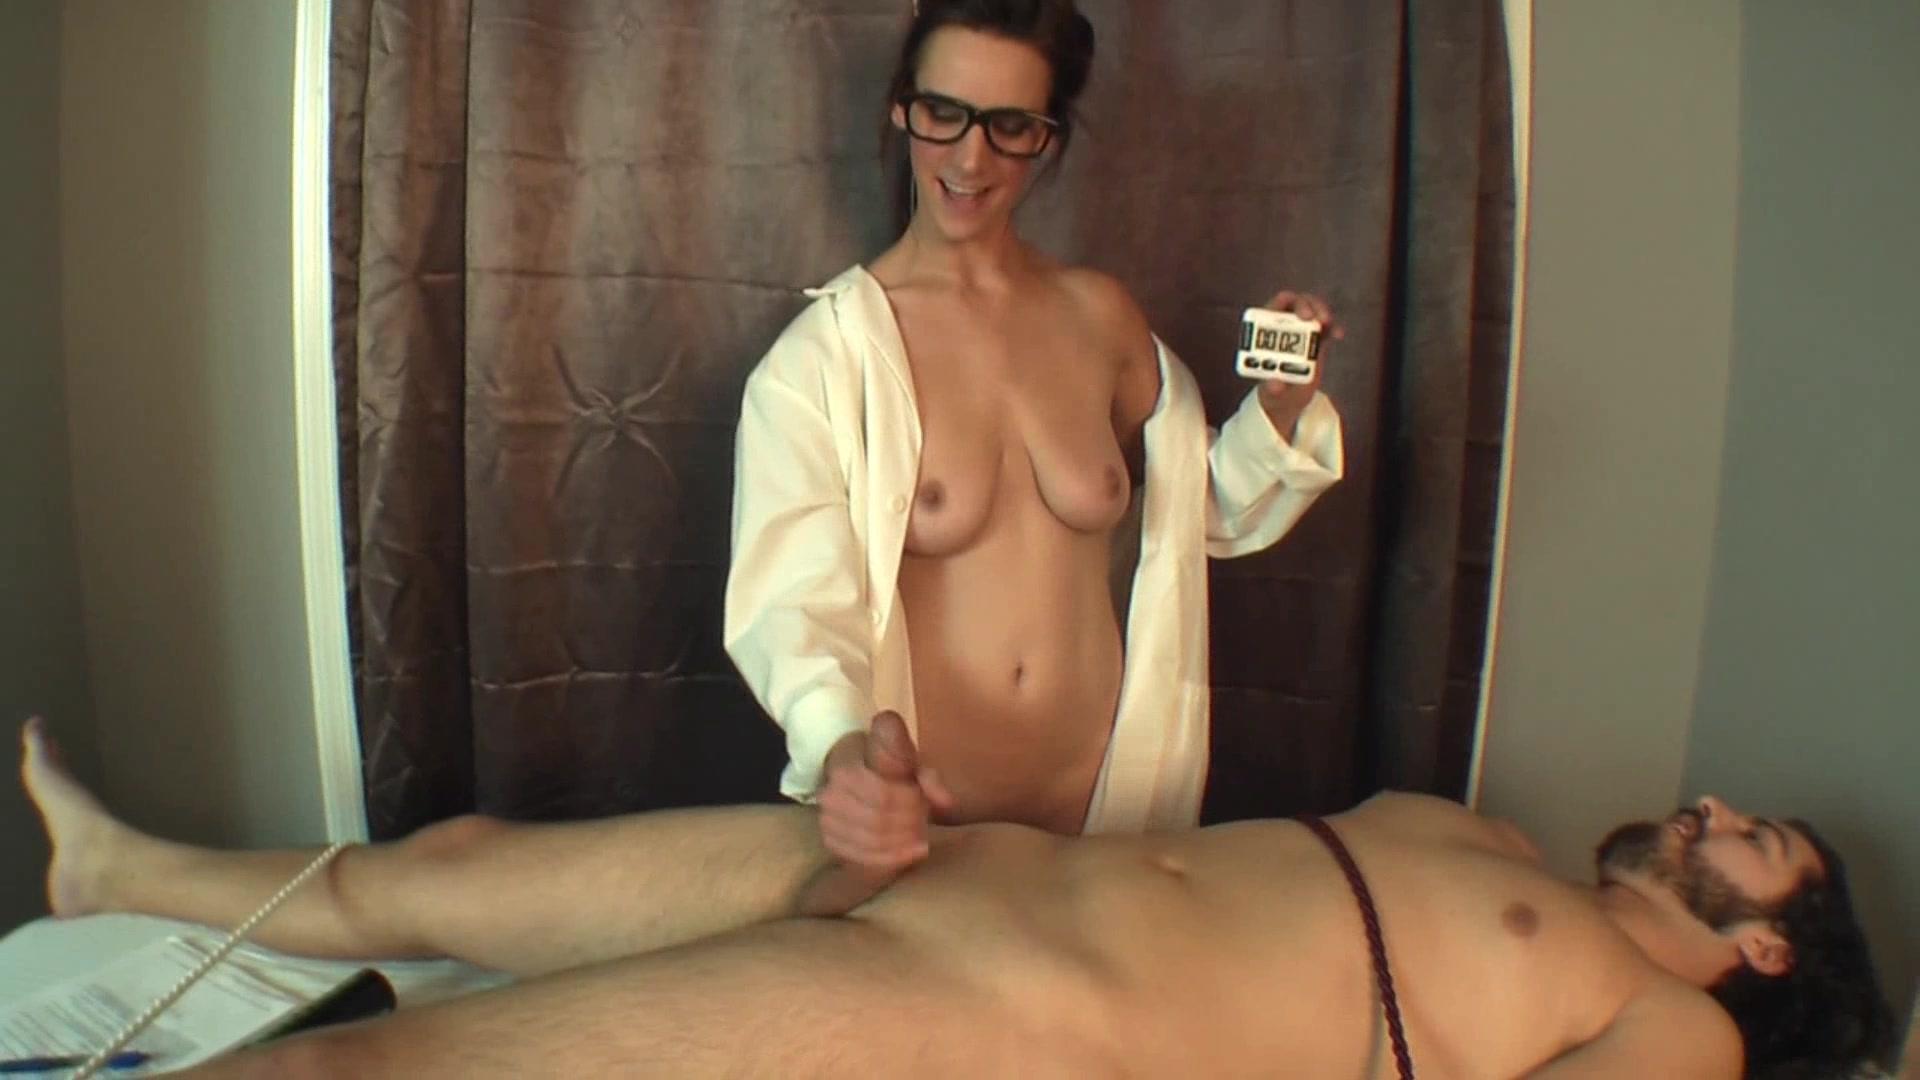 Amateur threesome jd premature ejaculation